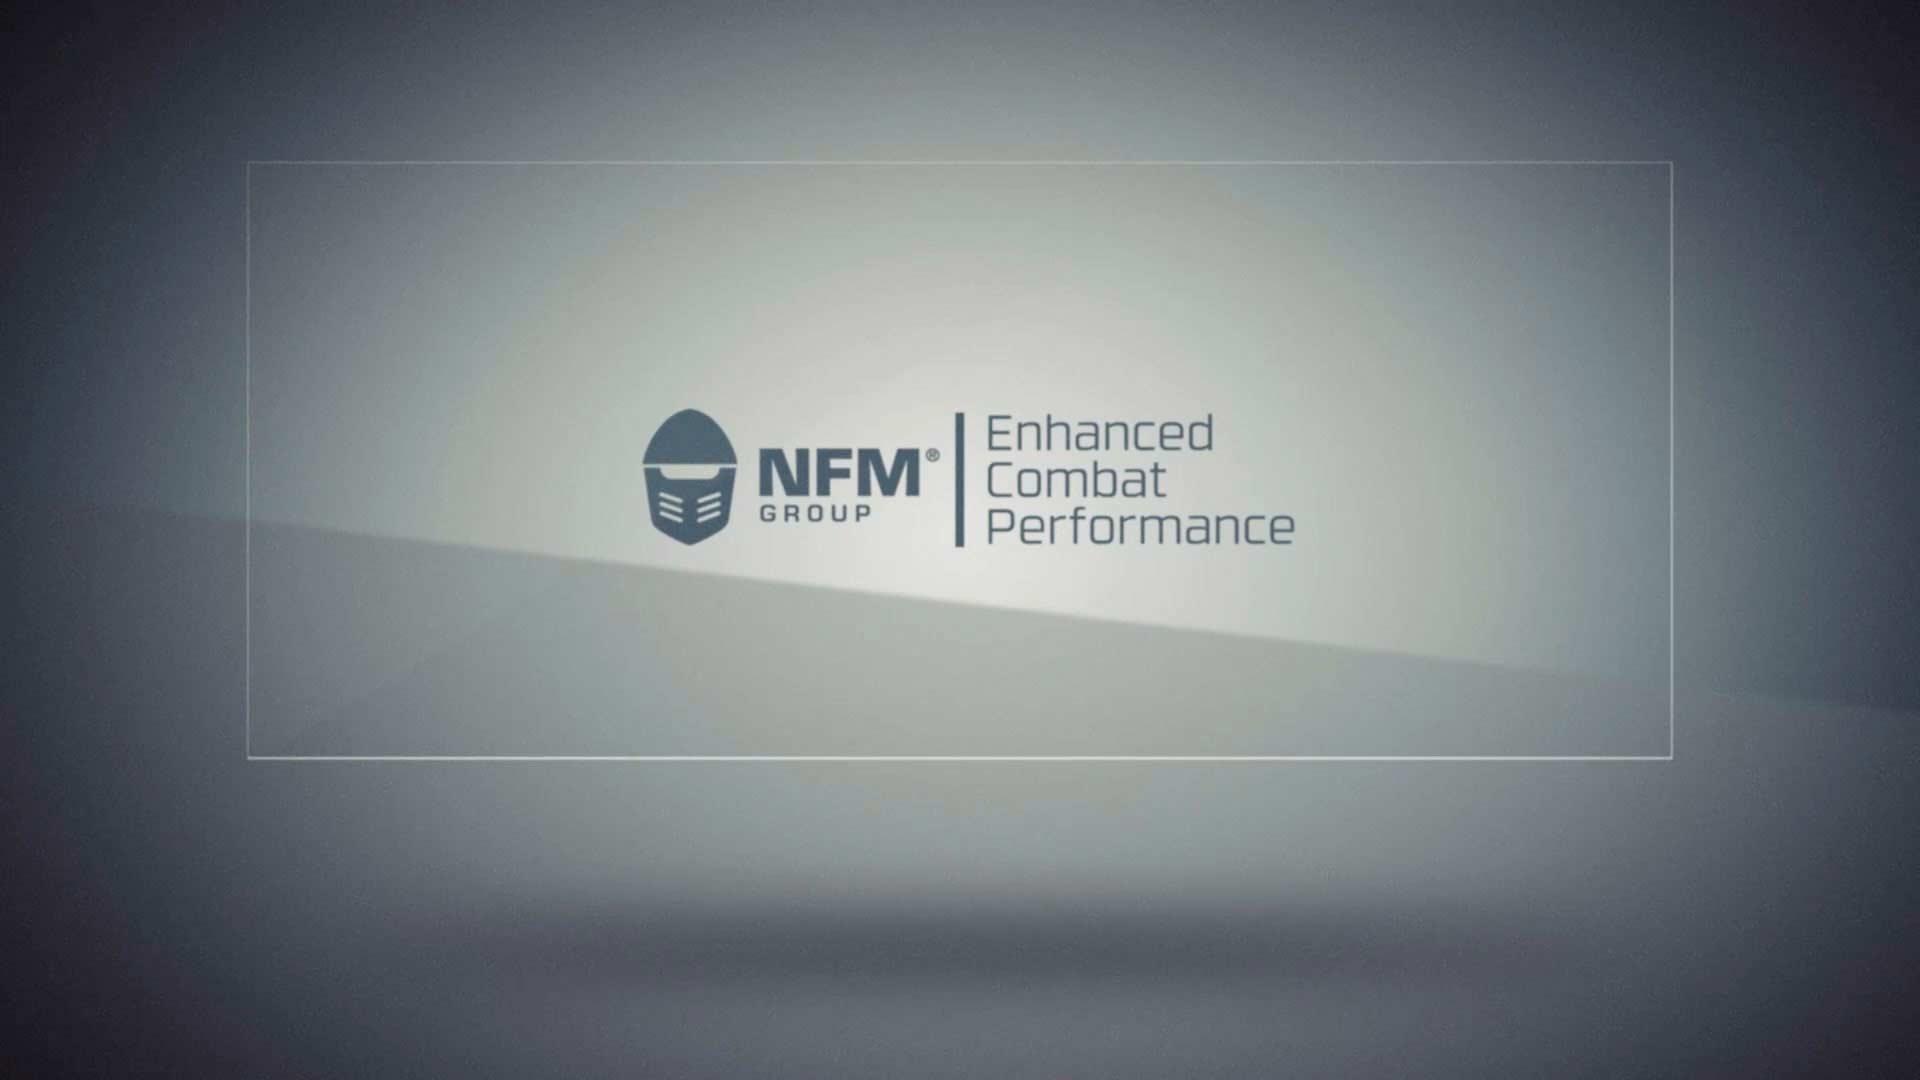 NFM Corporate Capabilities